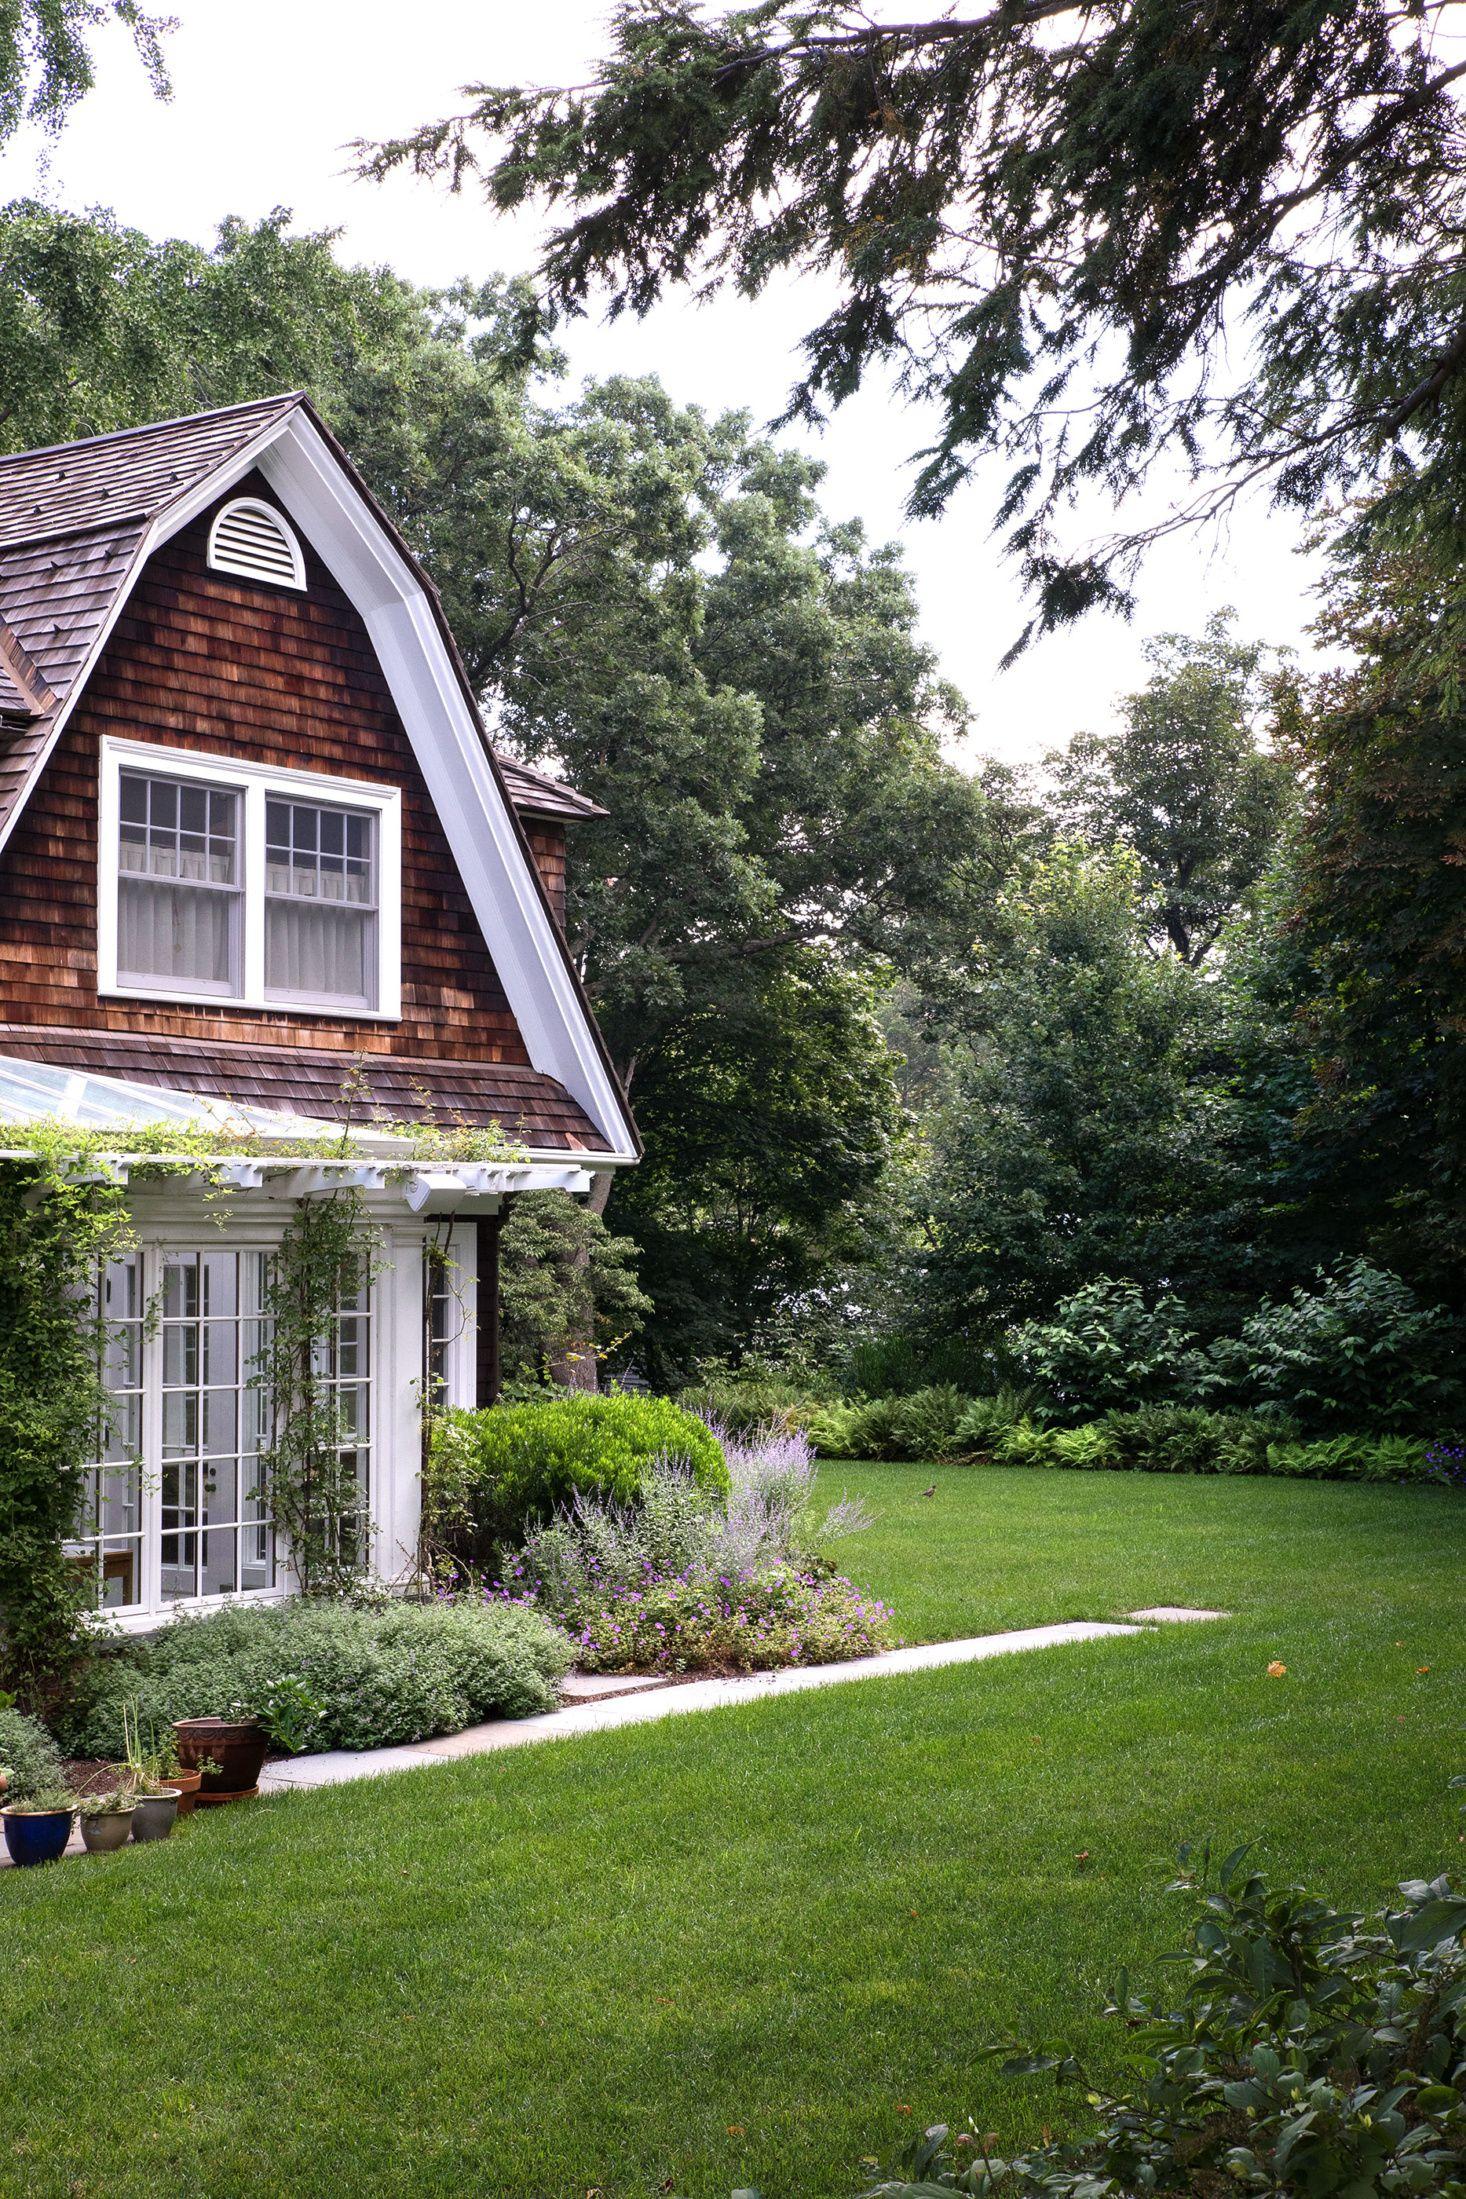 c9aa2e71b73c5440b2fbbad2b555073c - Better Homes And Gardens Grande Prairie Alberta